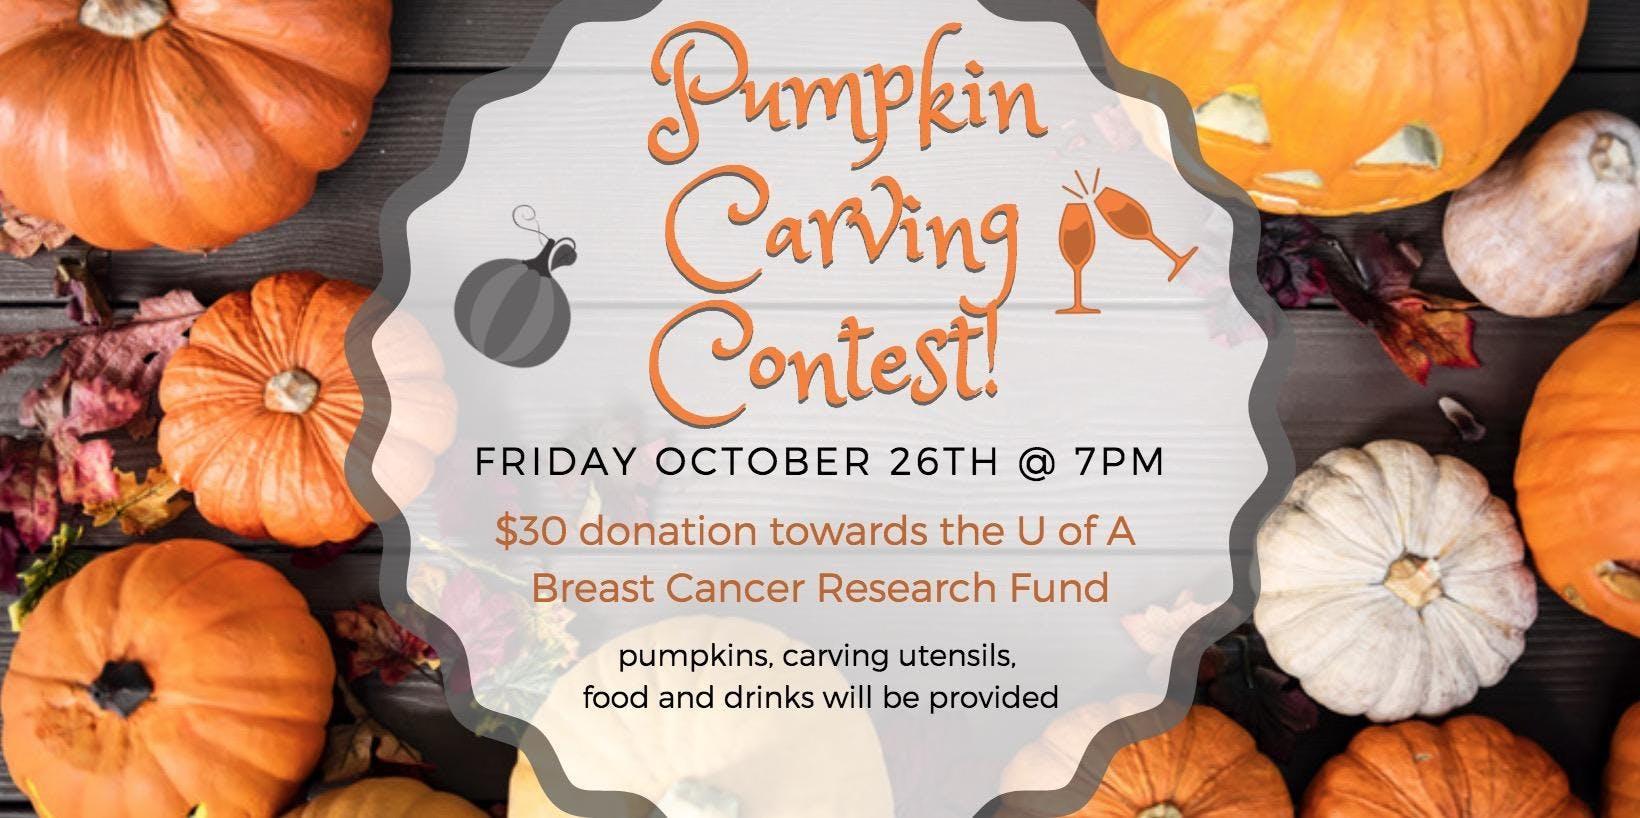 Arcadia Jabz Pumpkin Carving Contest!